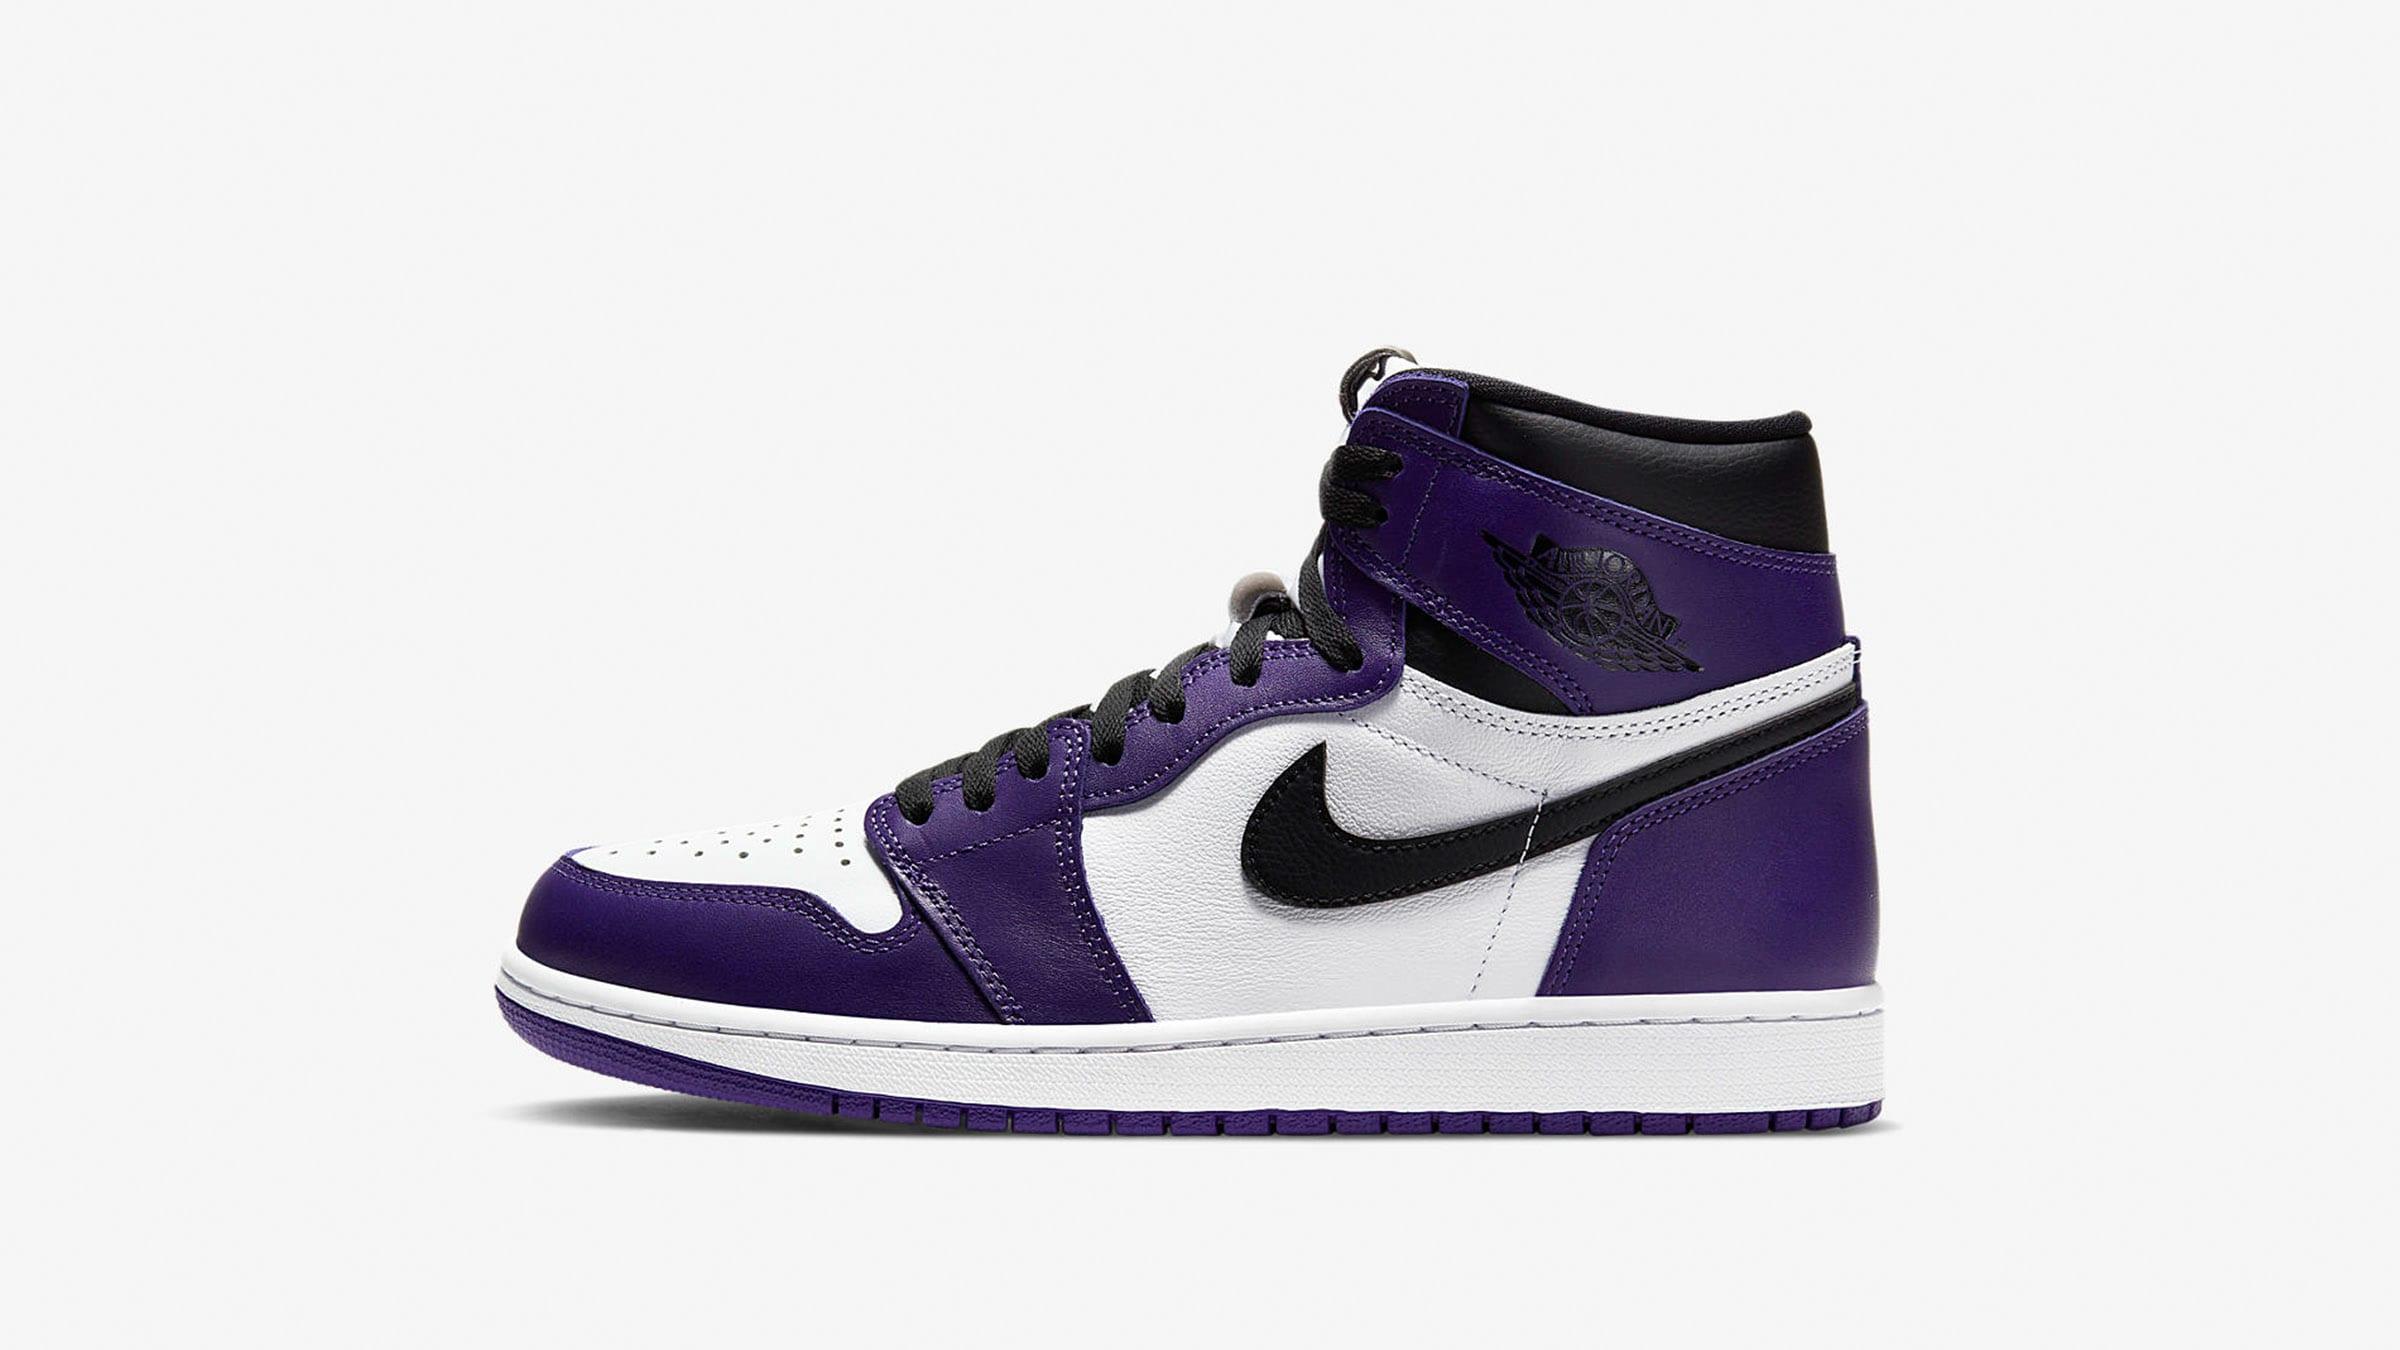 Nike Air Jordan 1 Retro High OG 'Court